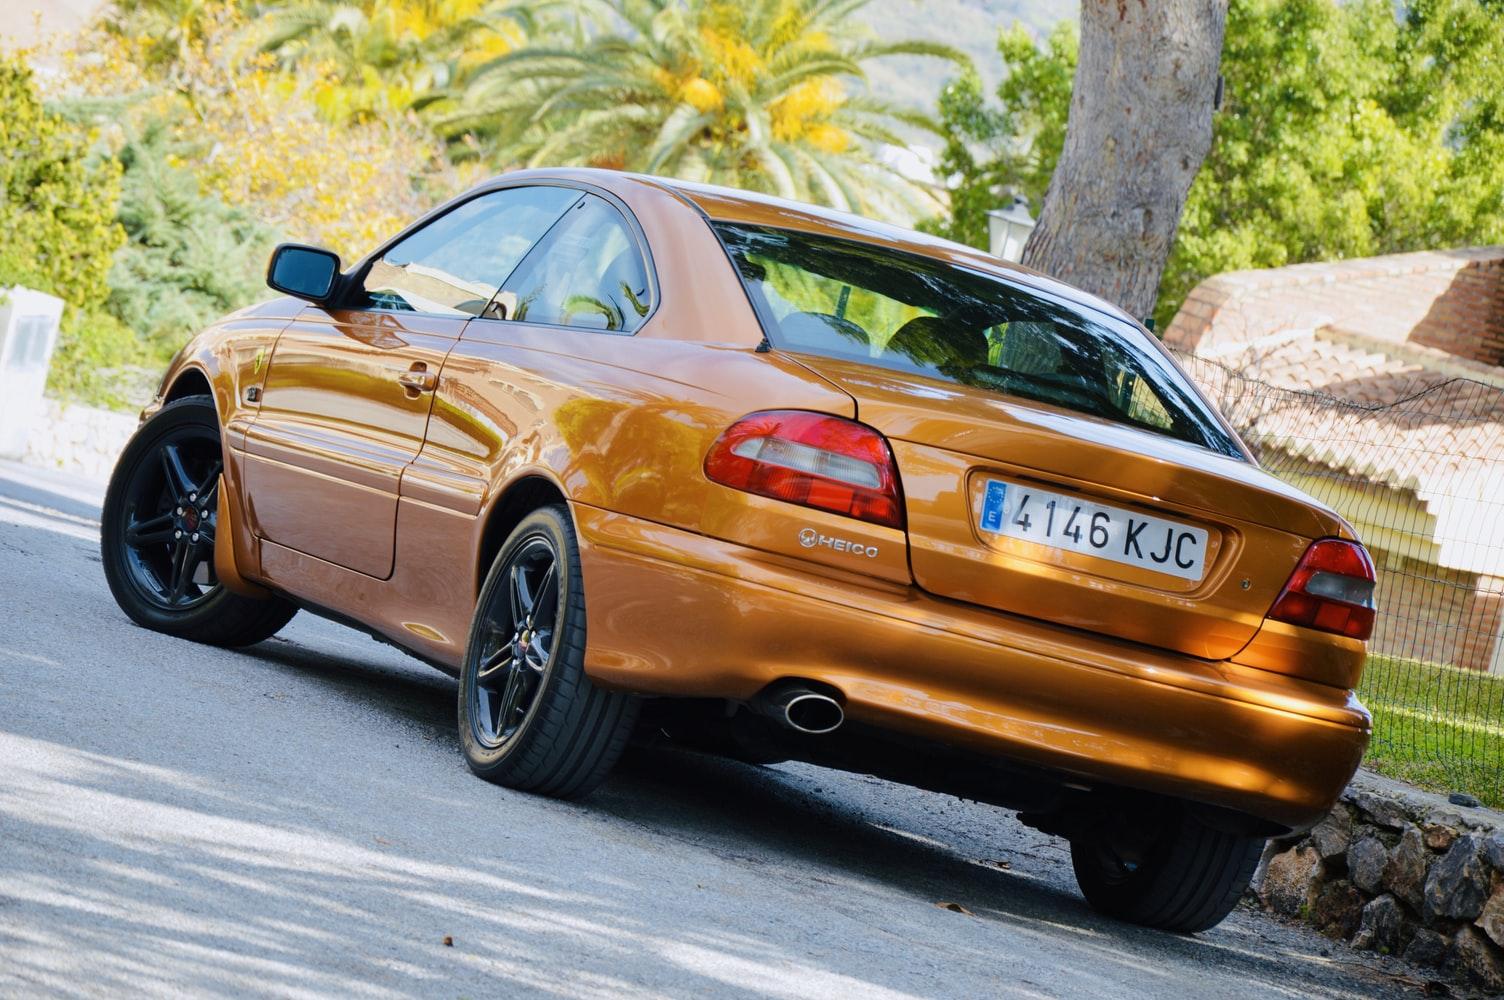 Volvo 70 C70 Coupe 1997 ManuelMena Unsplash photo-1574935311232-187764550859